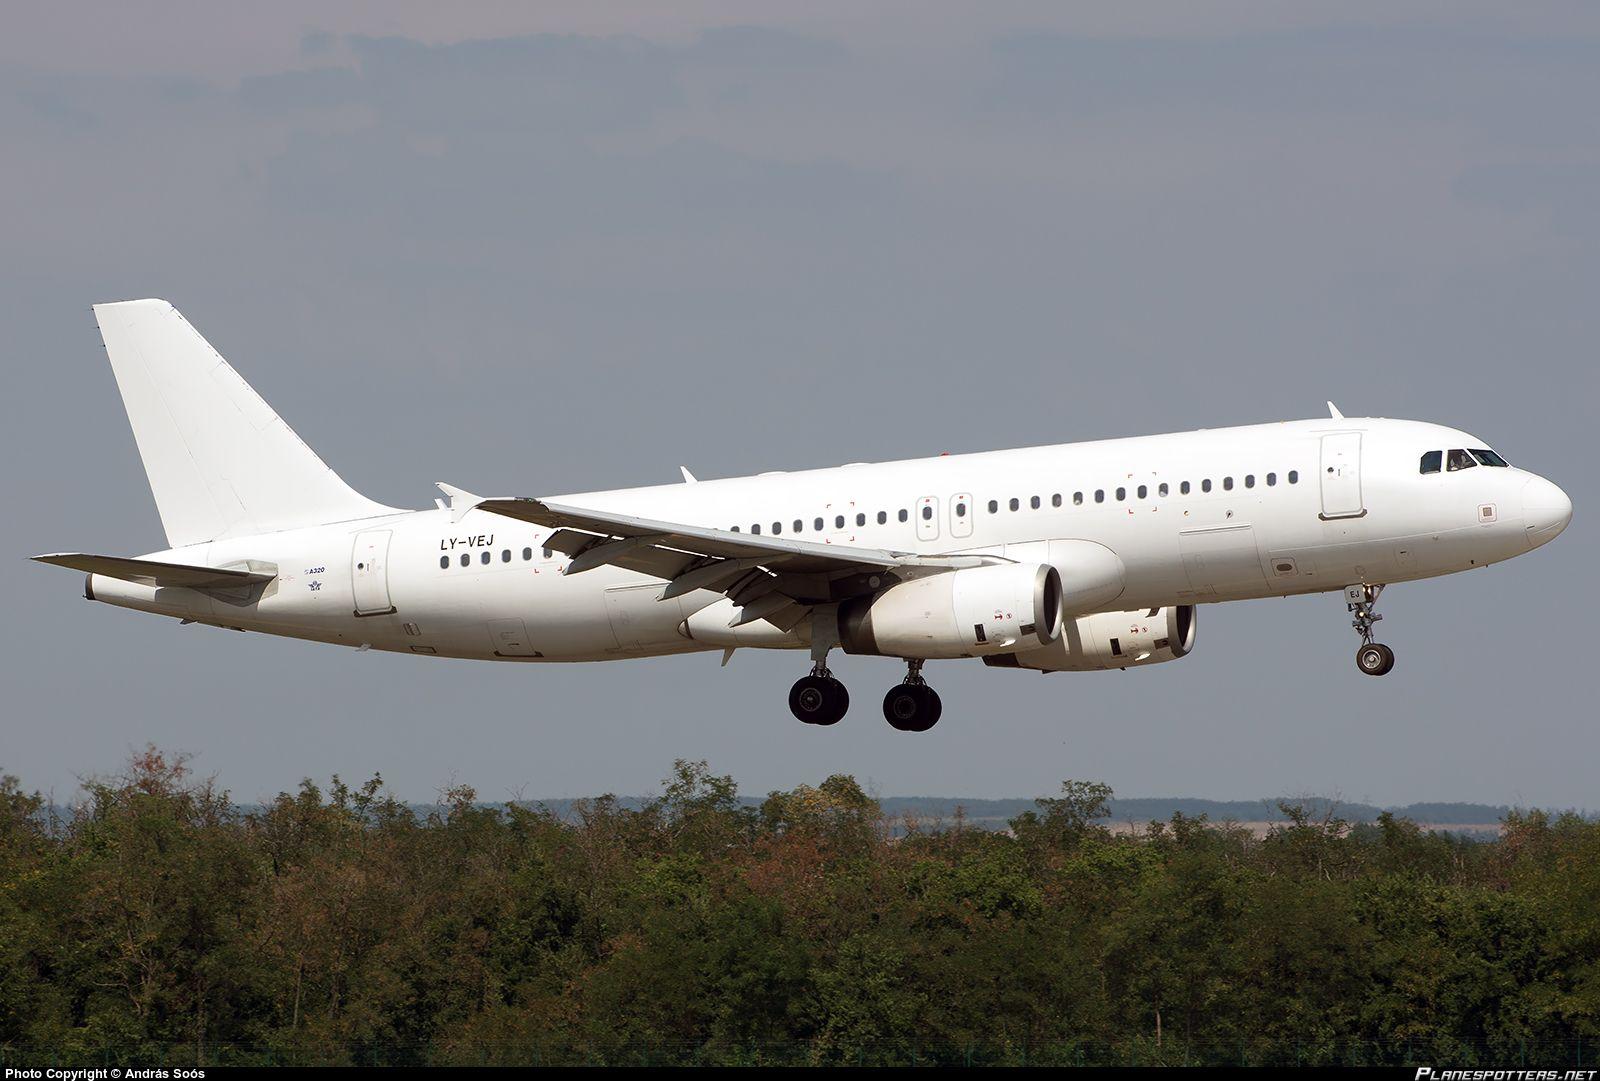 LY-VEJ Avion Express Airbus A320-232